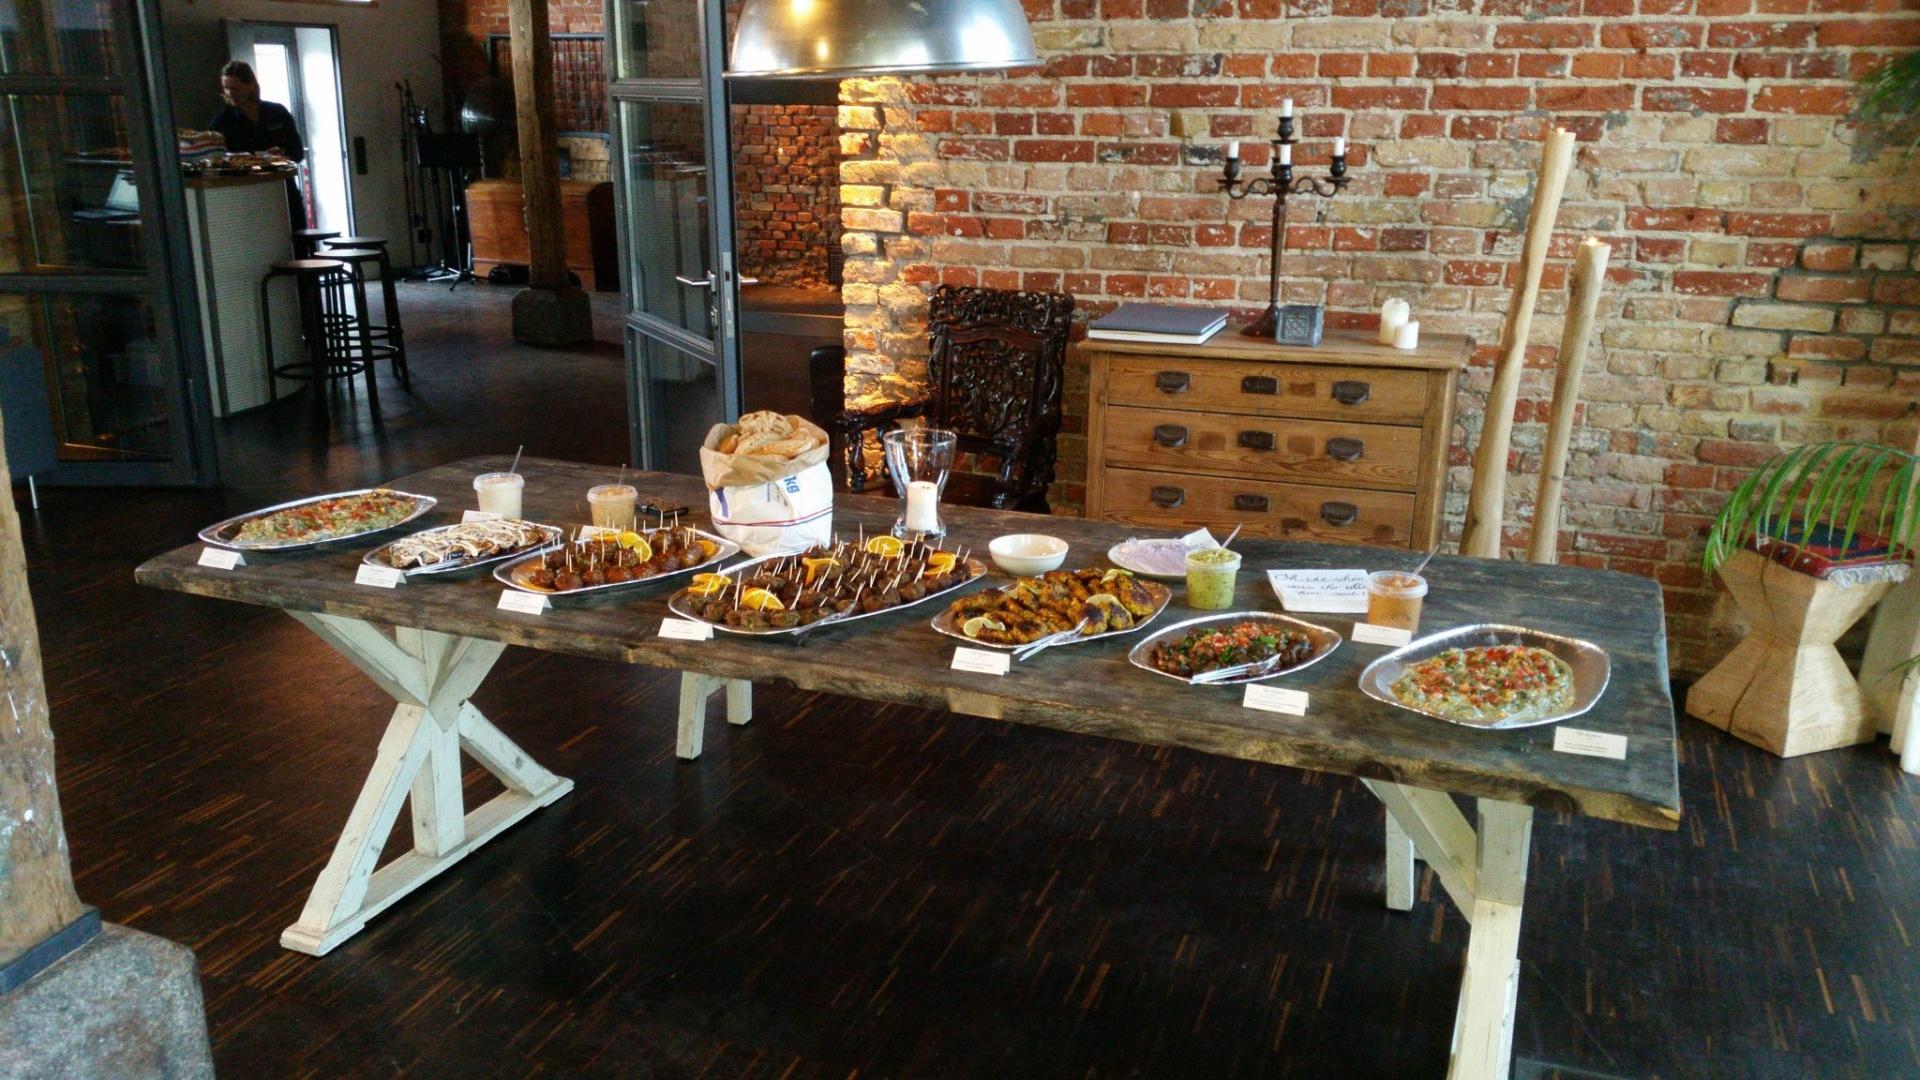 Köstliche Tapas Kreationen im Restaurant Le Golden Igel in Hamburg Neustadt & Catering